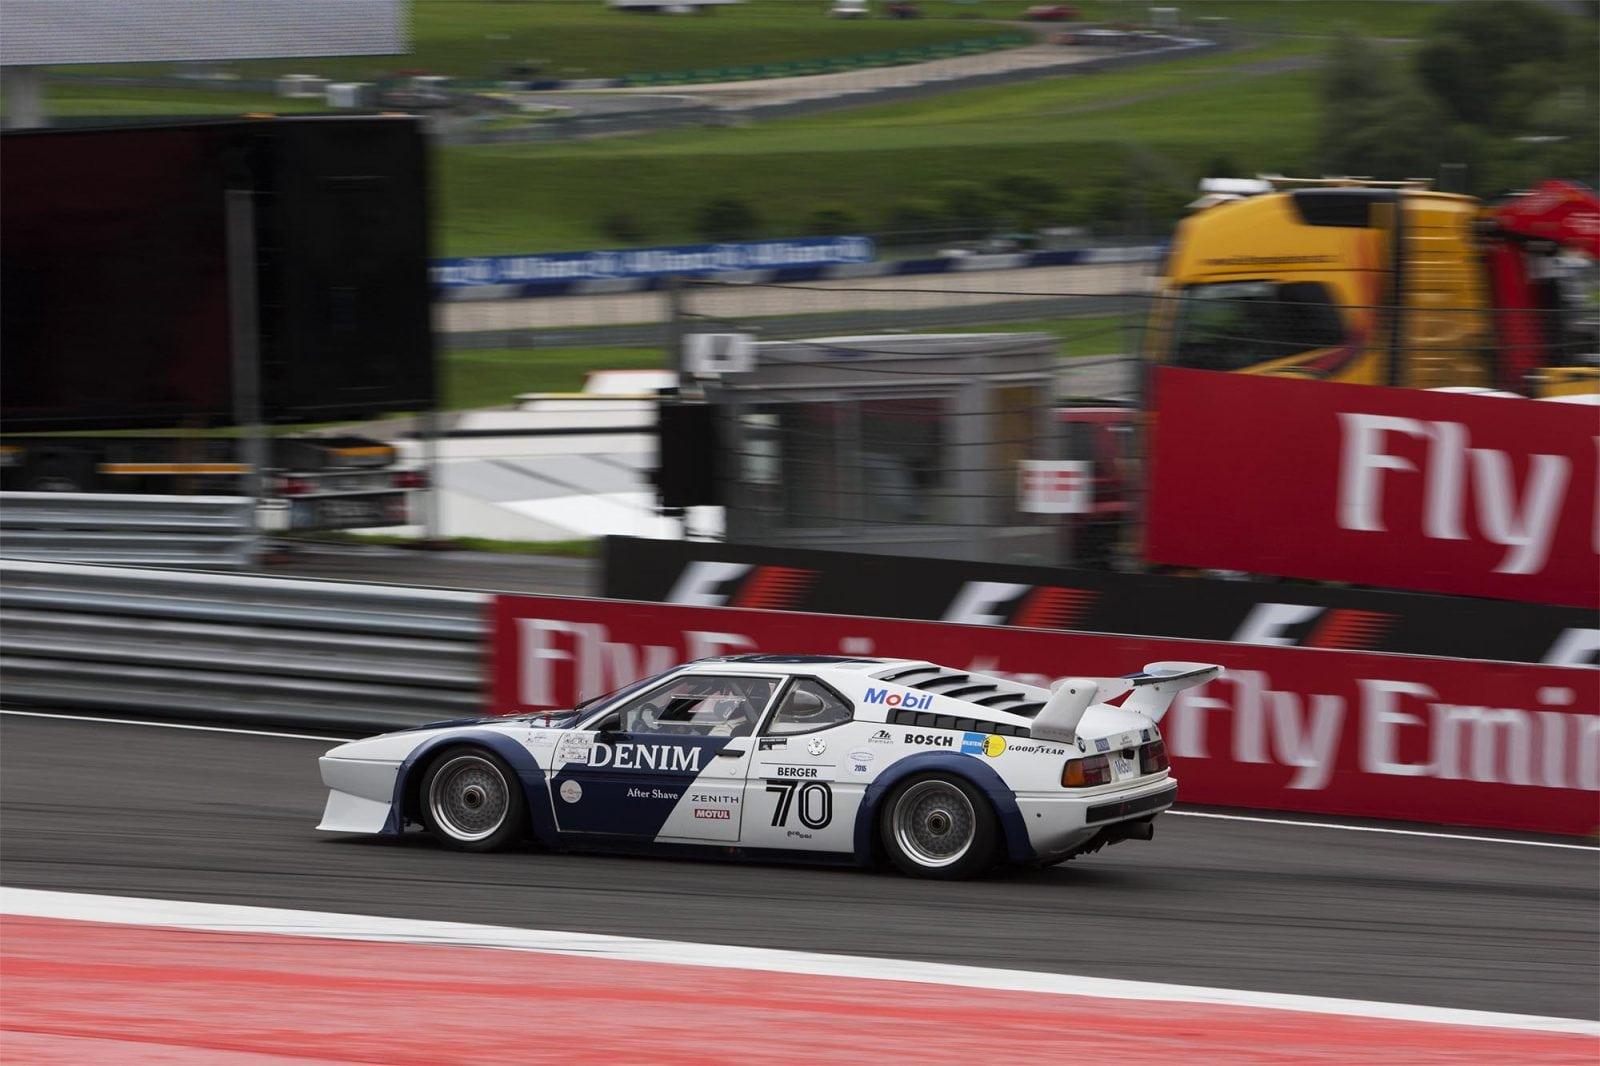 BMW M1 Procar #70 – Gerhard Berger